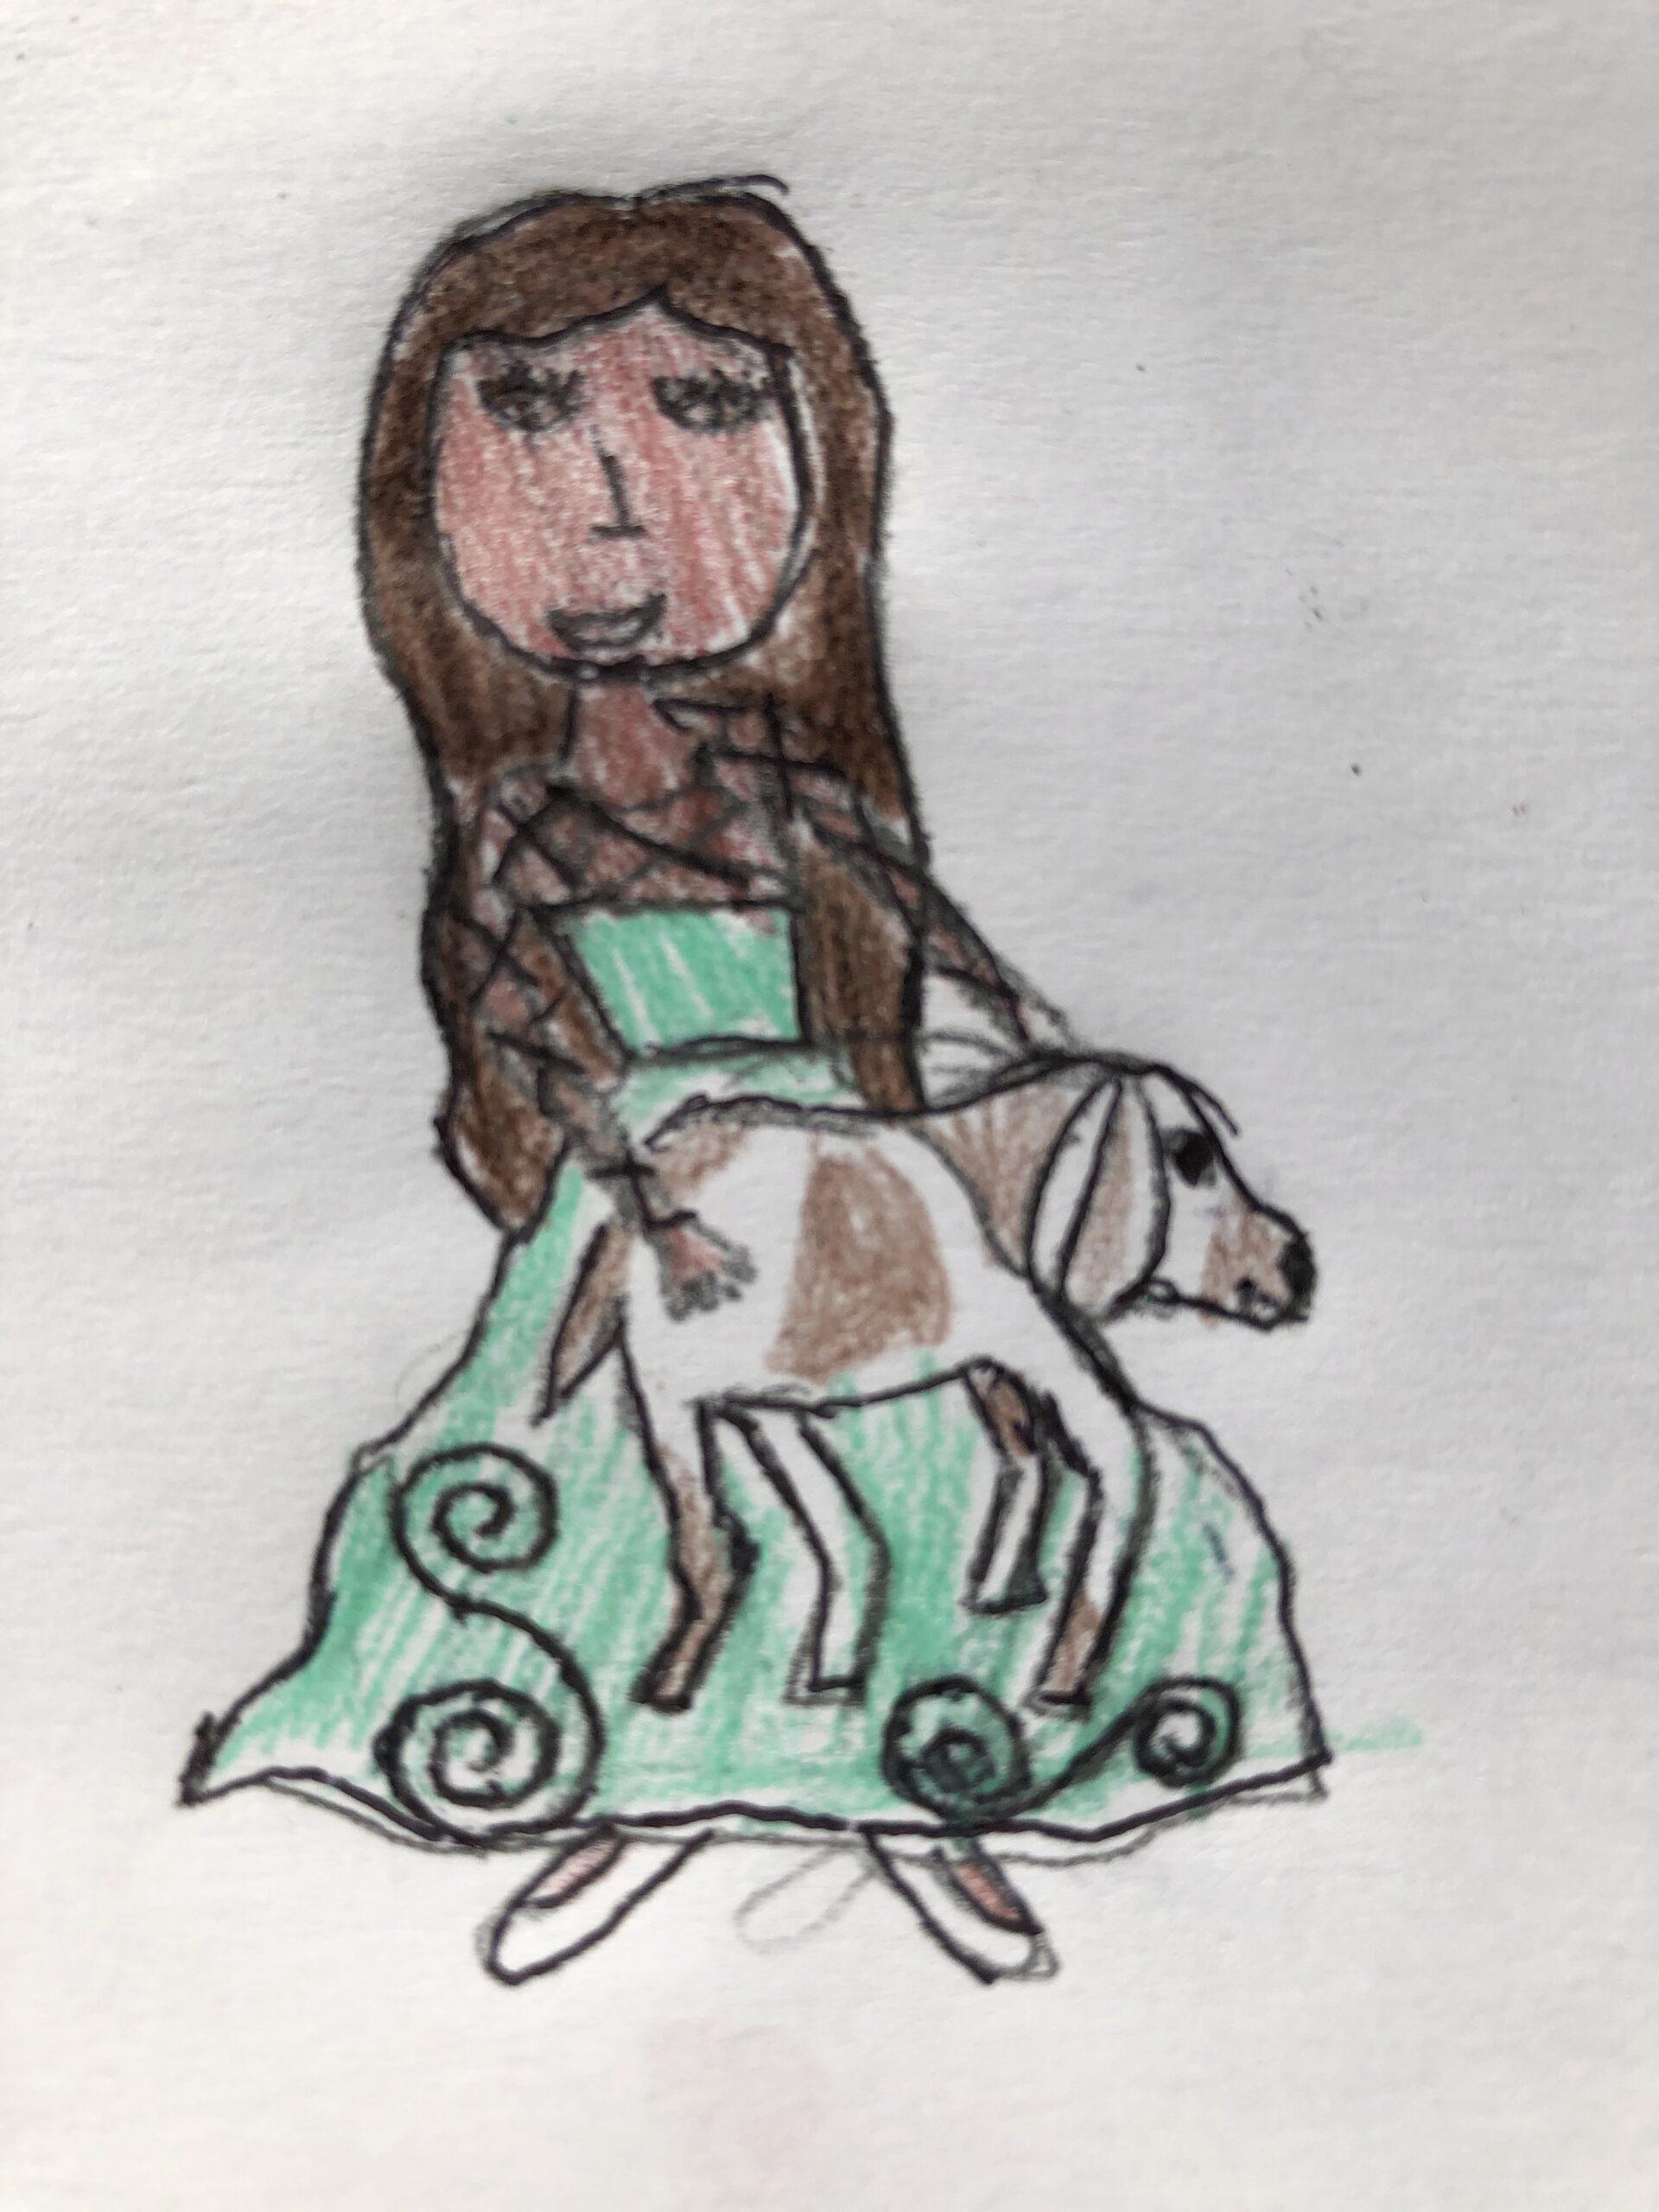 Emily Gruber, Age 10